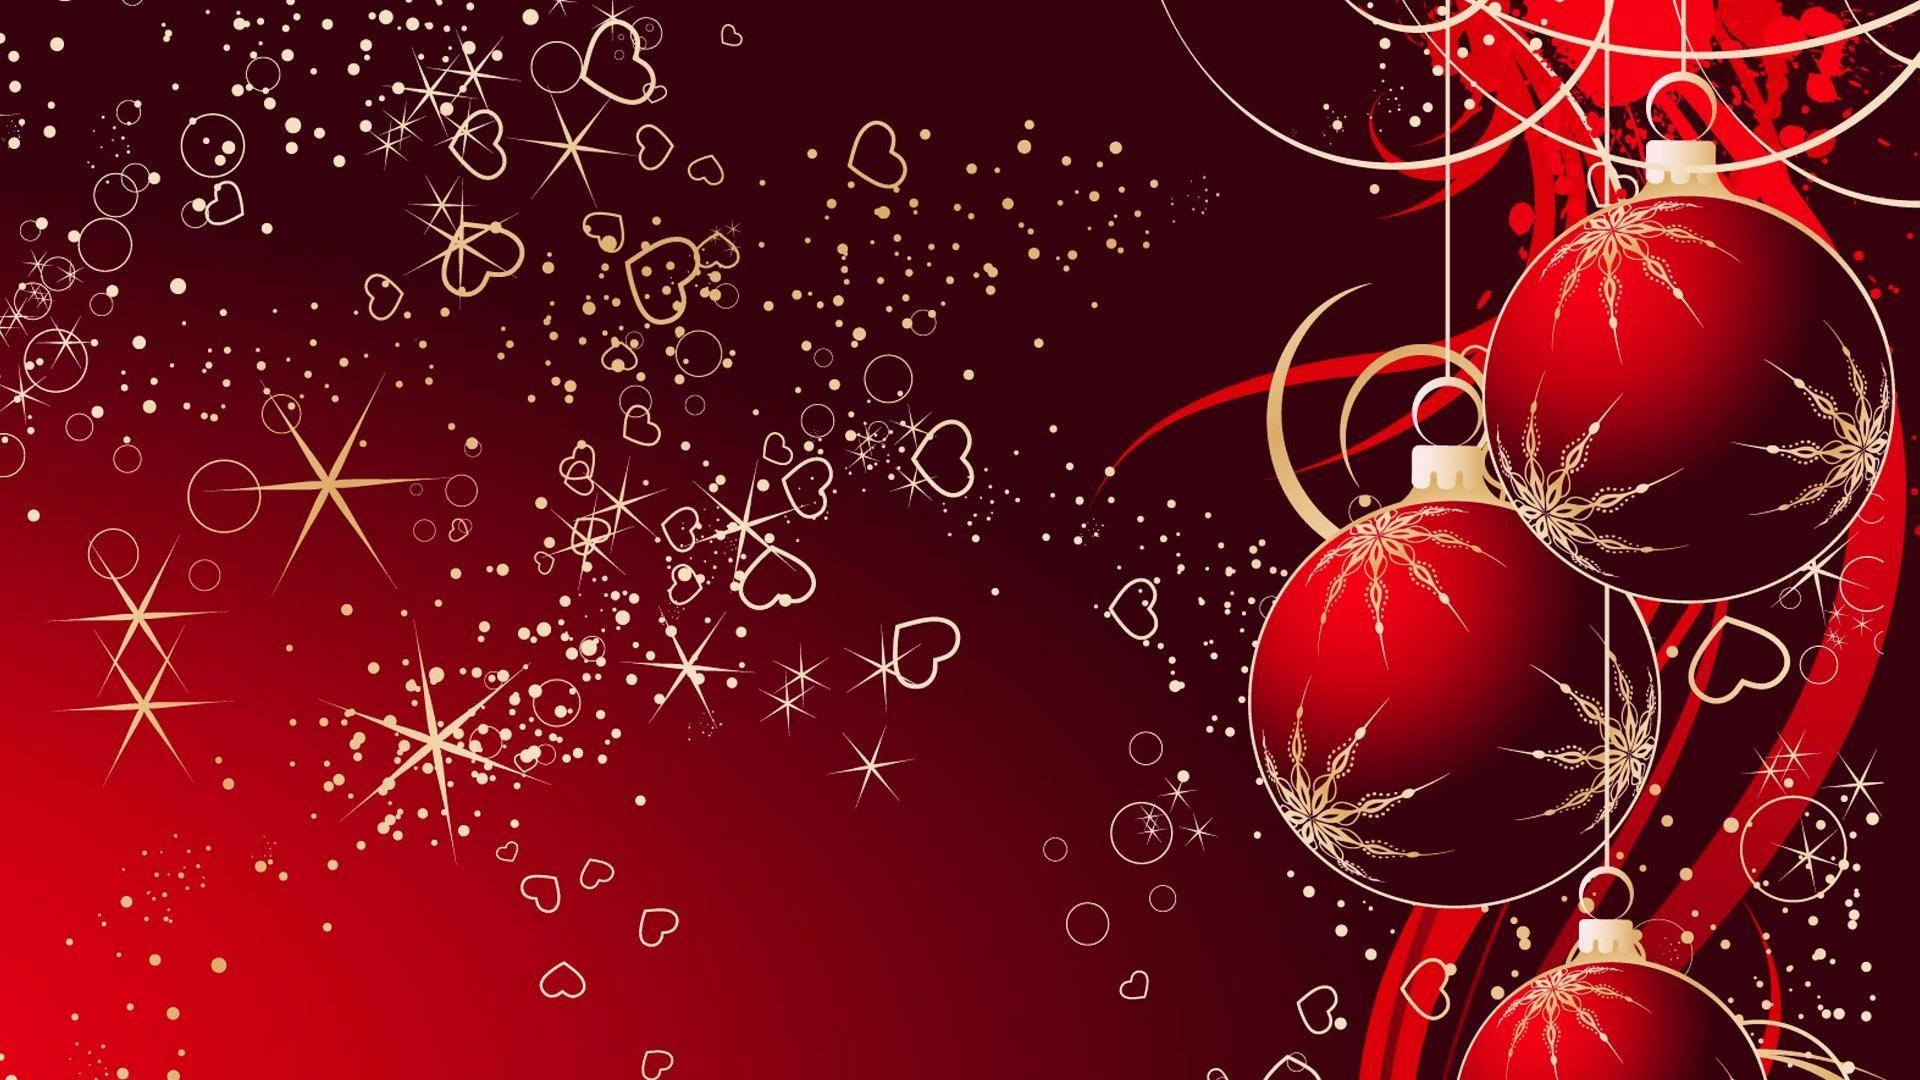 9. free-christmas-desktop-wallpapers-backgrounds10-600×338